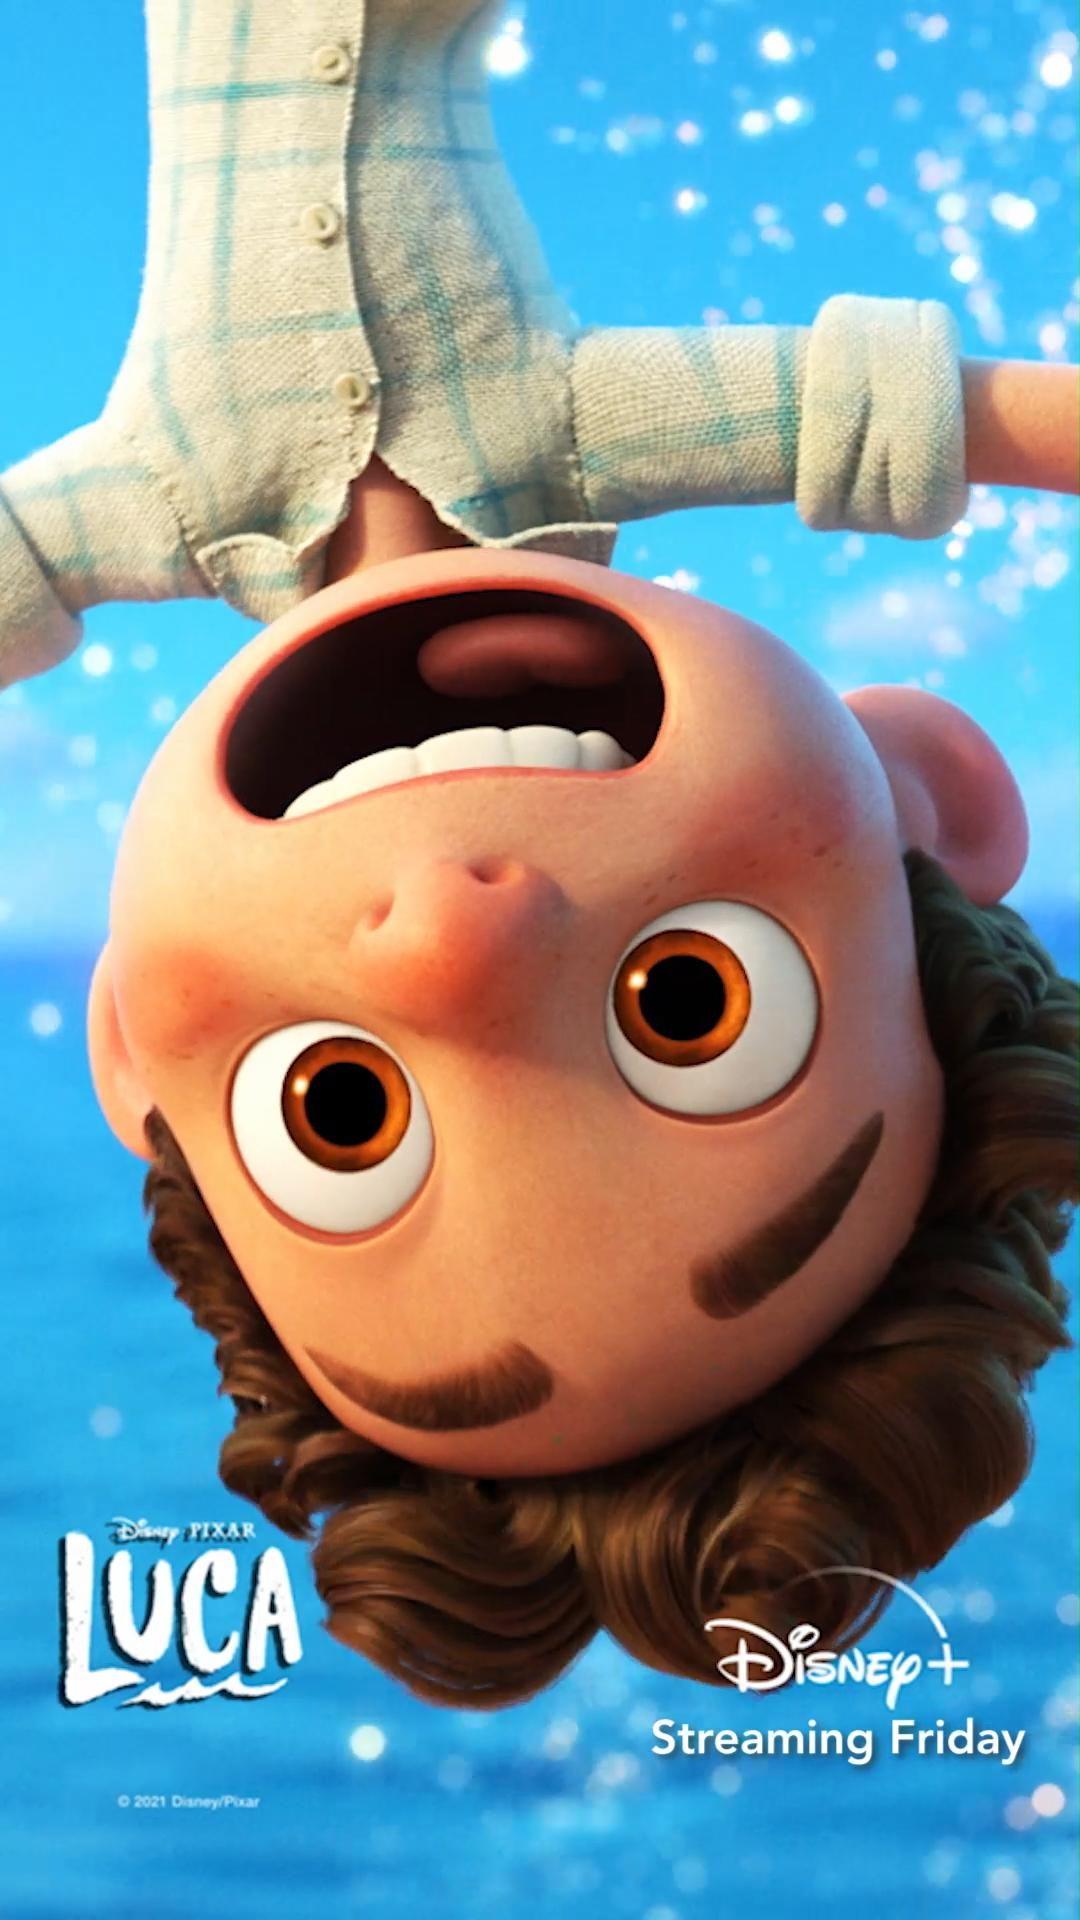 Disney And Pixar S Luca Friday Video In 2021 Pixar Lucas Movie Disney